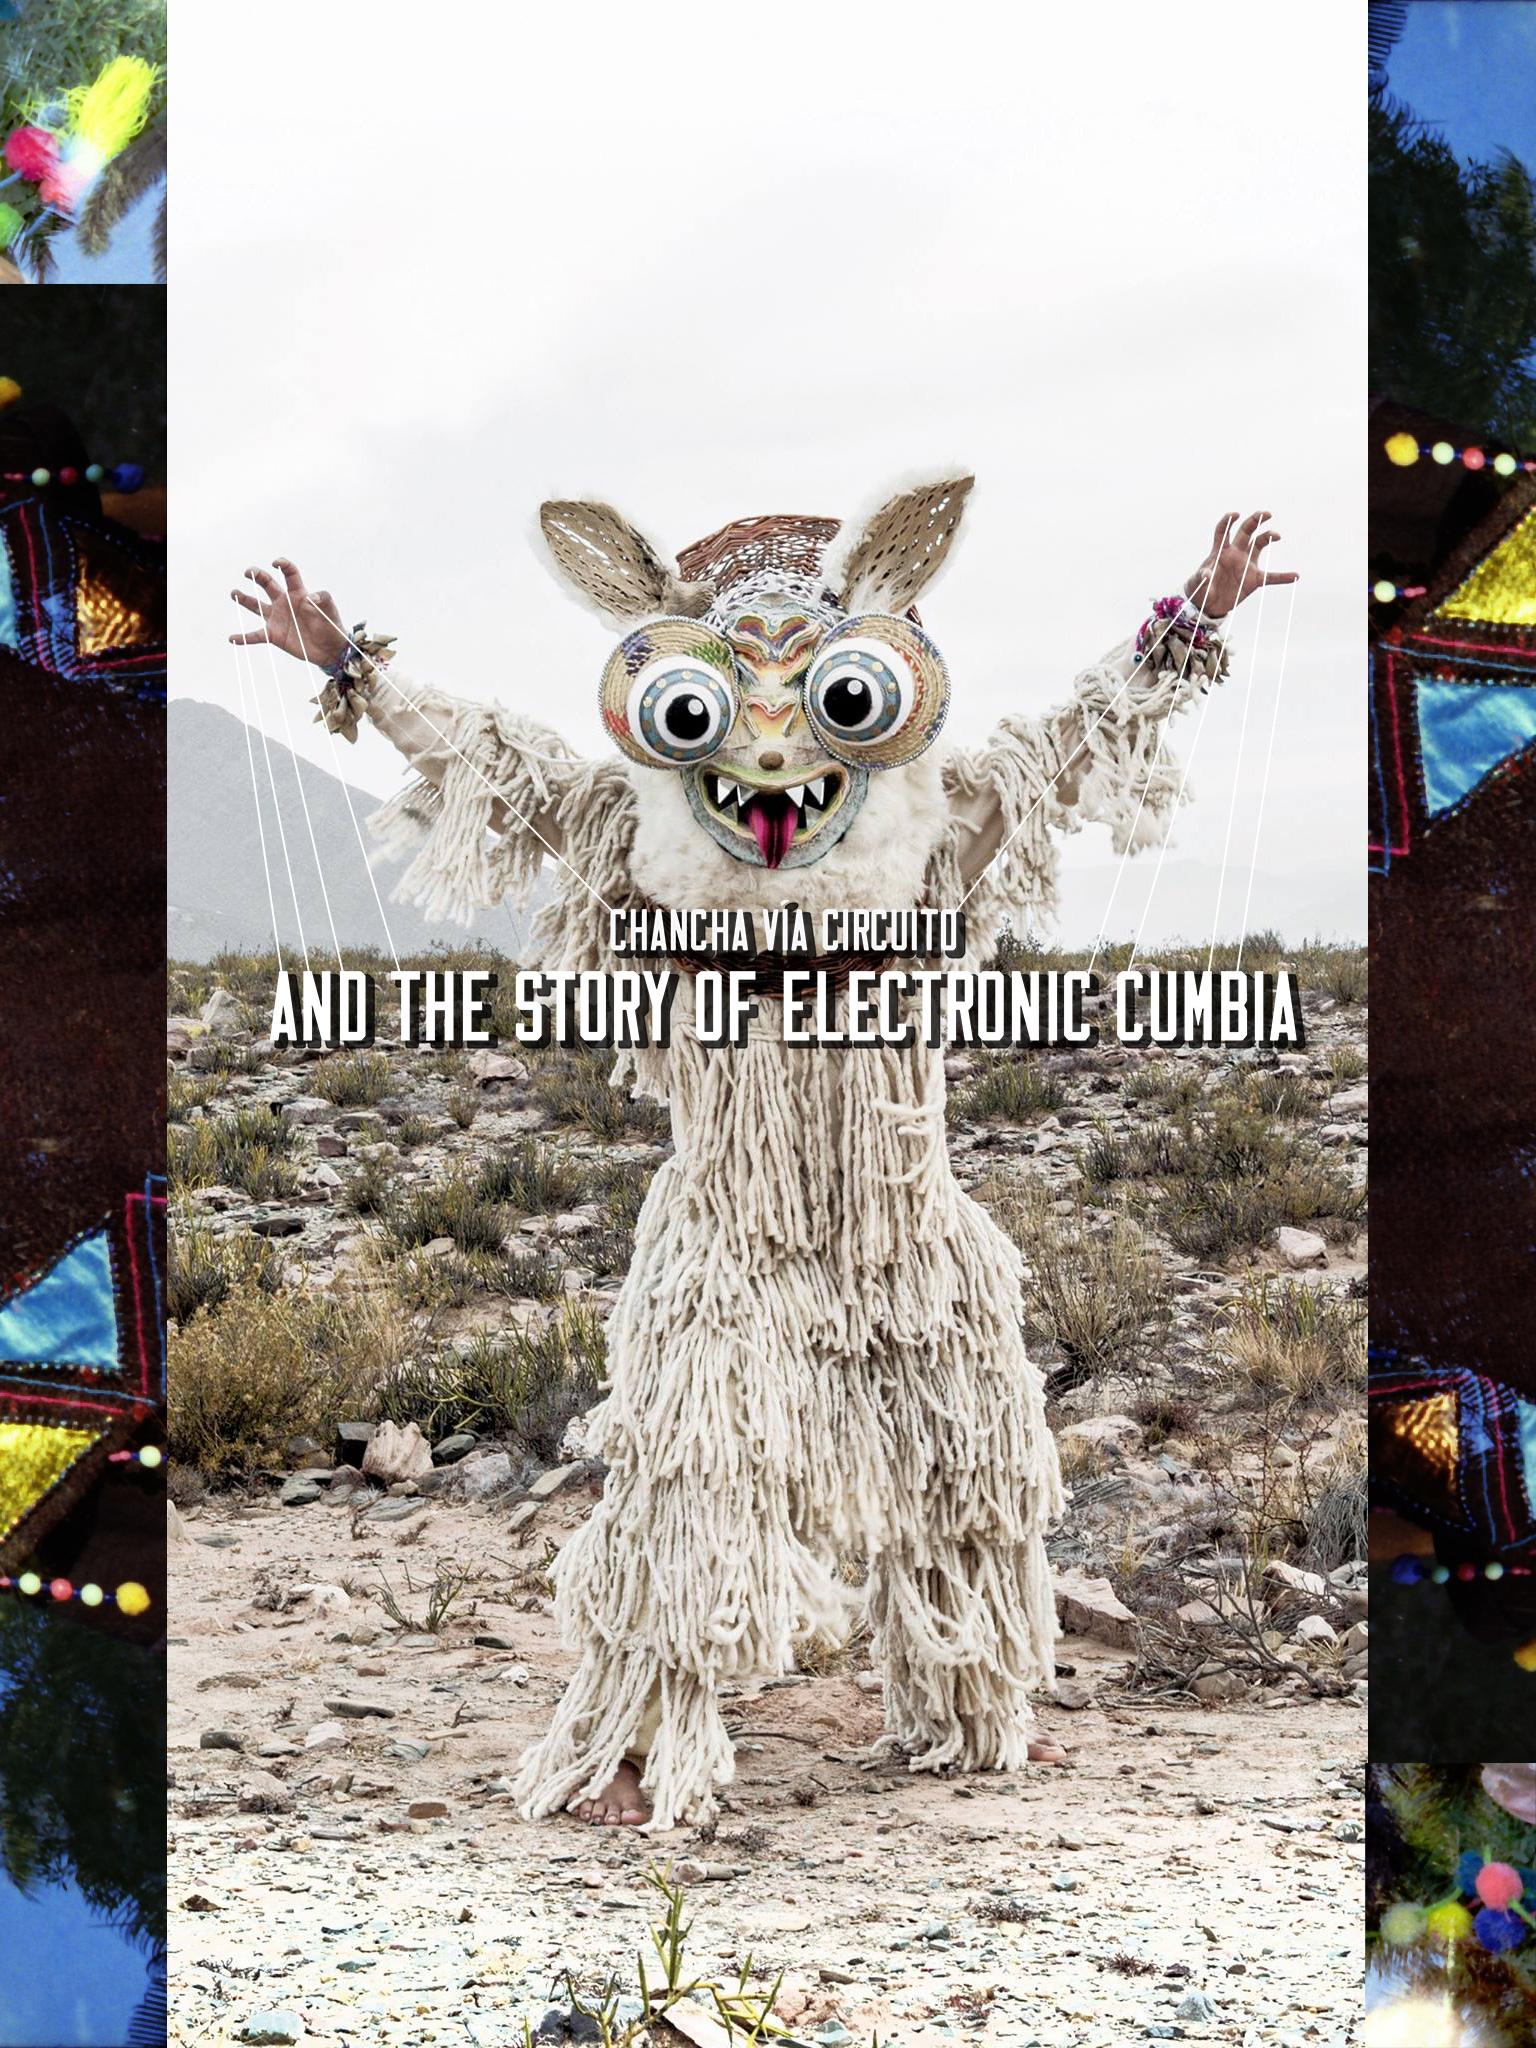 Chancha Vía Circuito and the story of electronic cumbia